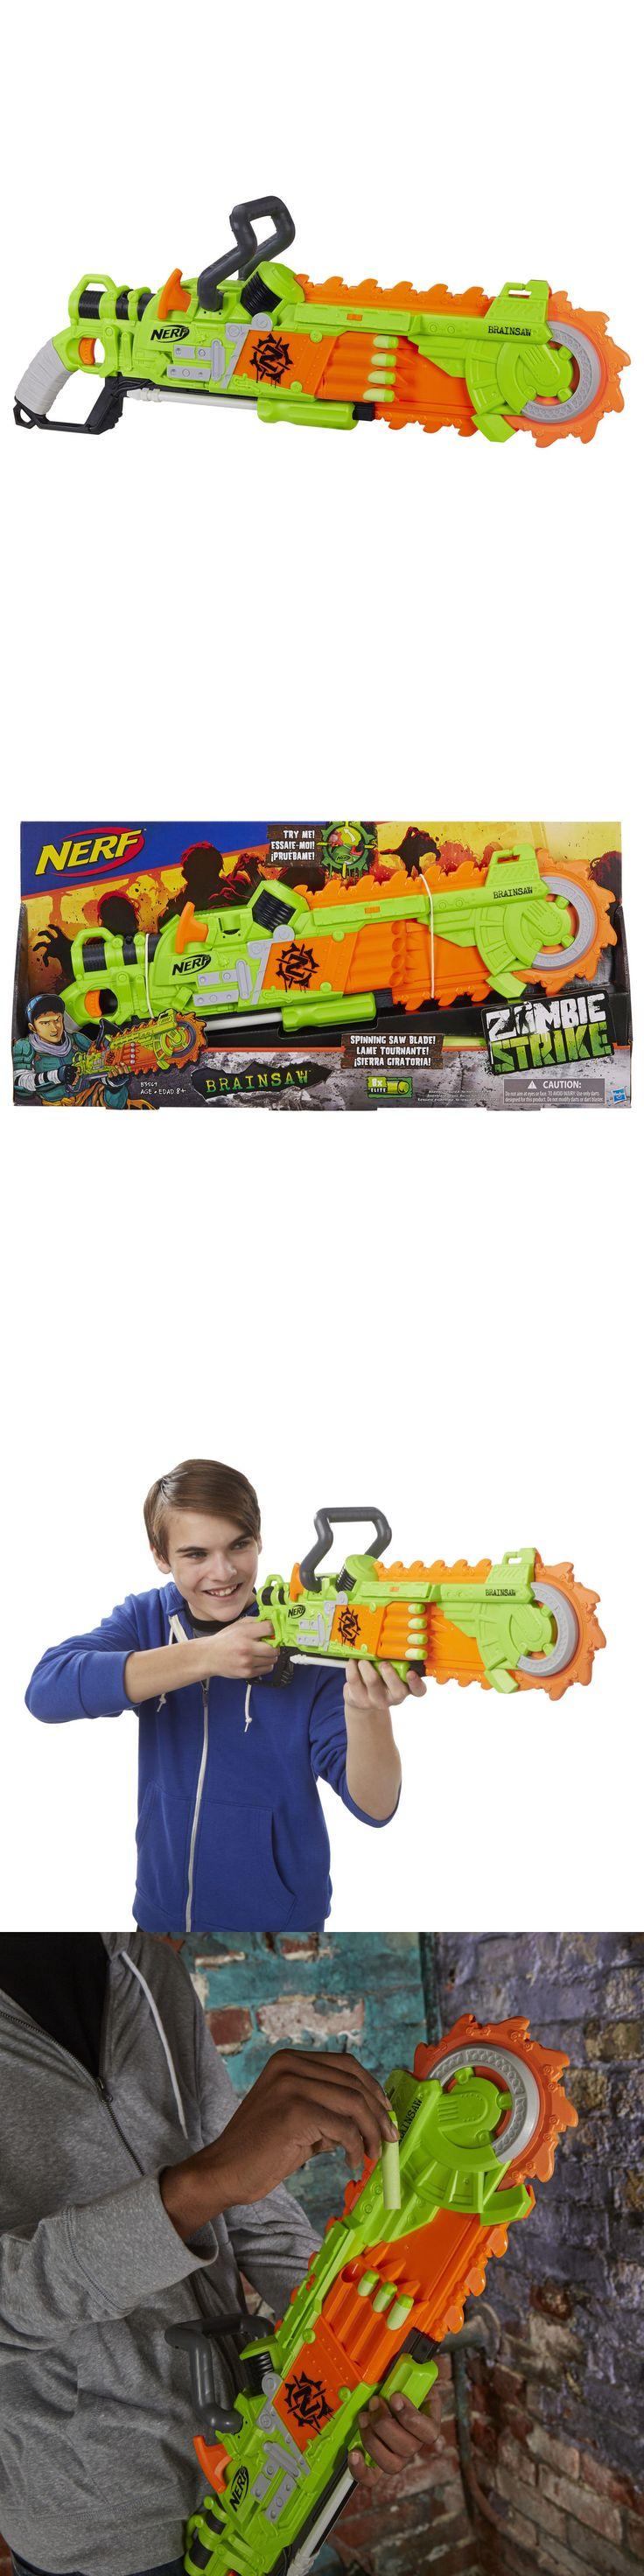 Dart Guns and Soft Darts 158749: Nerf Zombie Strike Brainsaw Blaster Gun Toy Spinning Saw Blade 8 Foam Darts Dart -> BUY IT NOW ONLY: $40.51 on eBay!